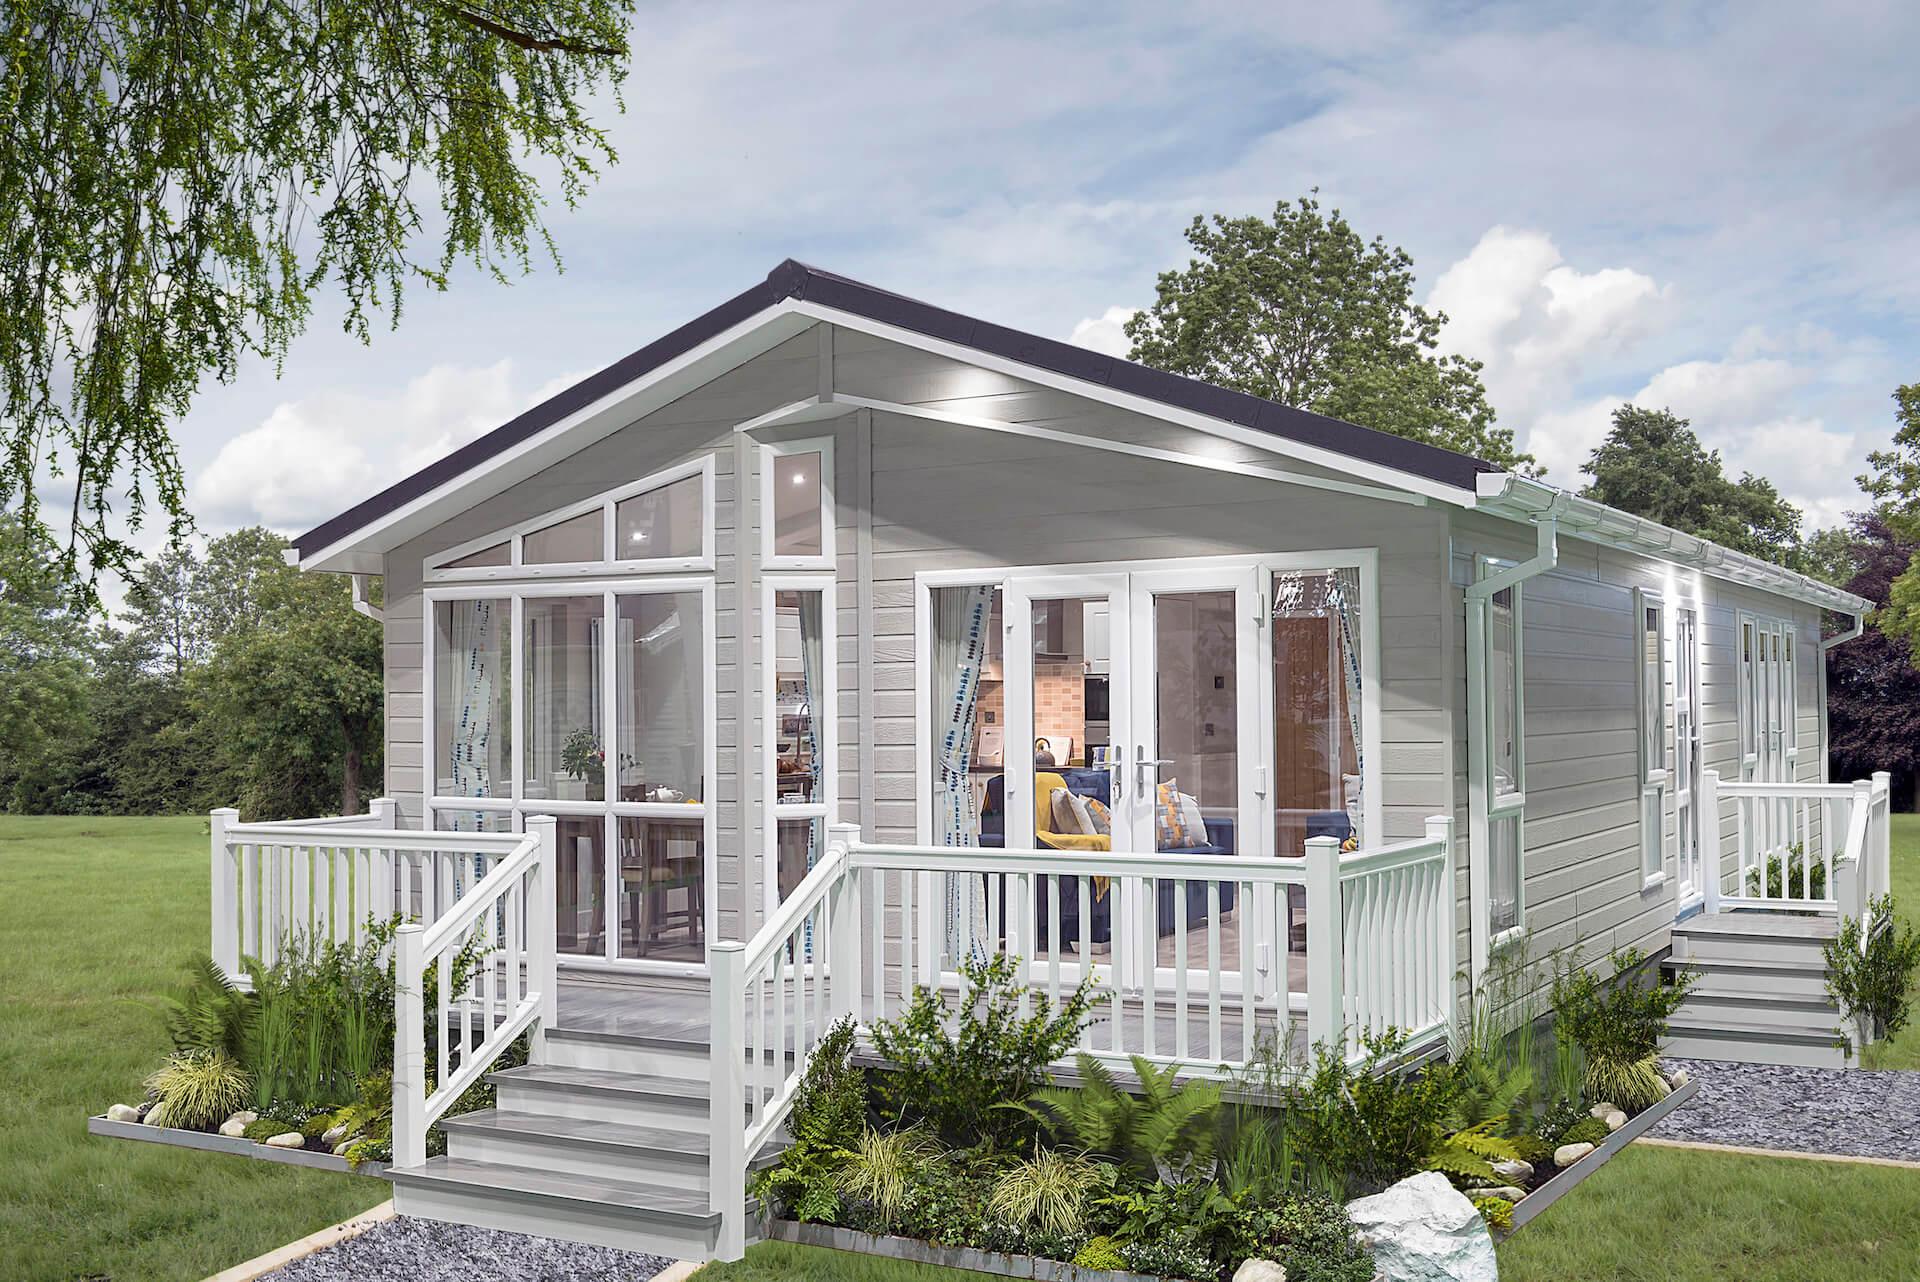 Summerhouse-Luxury-Lodge-Exterior-2018